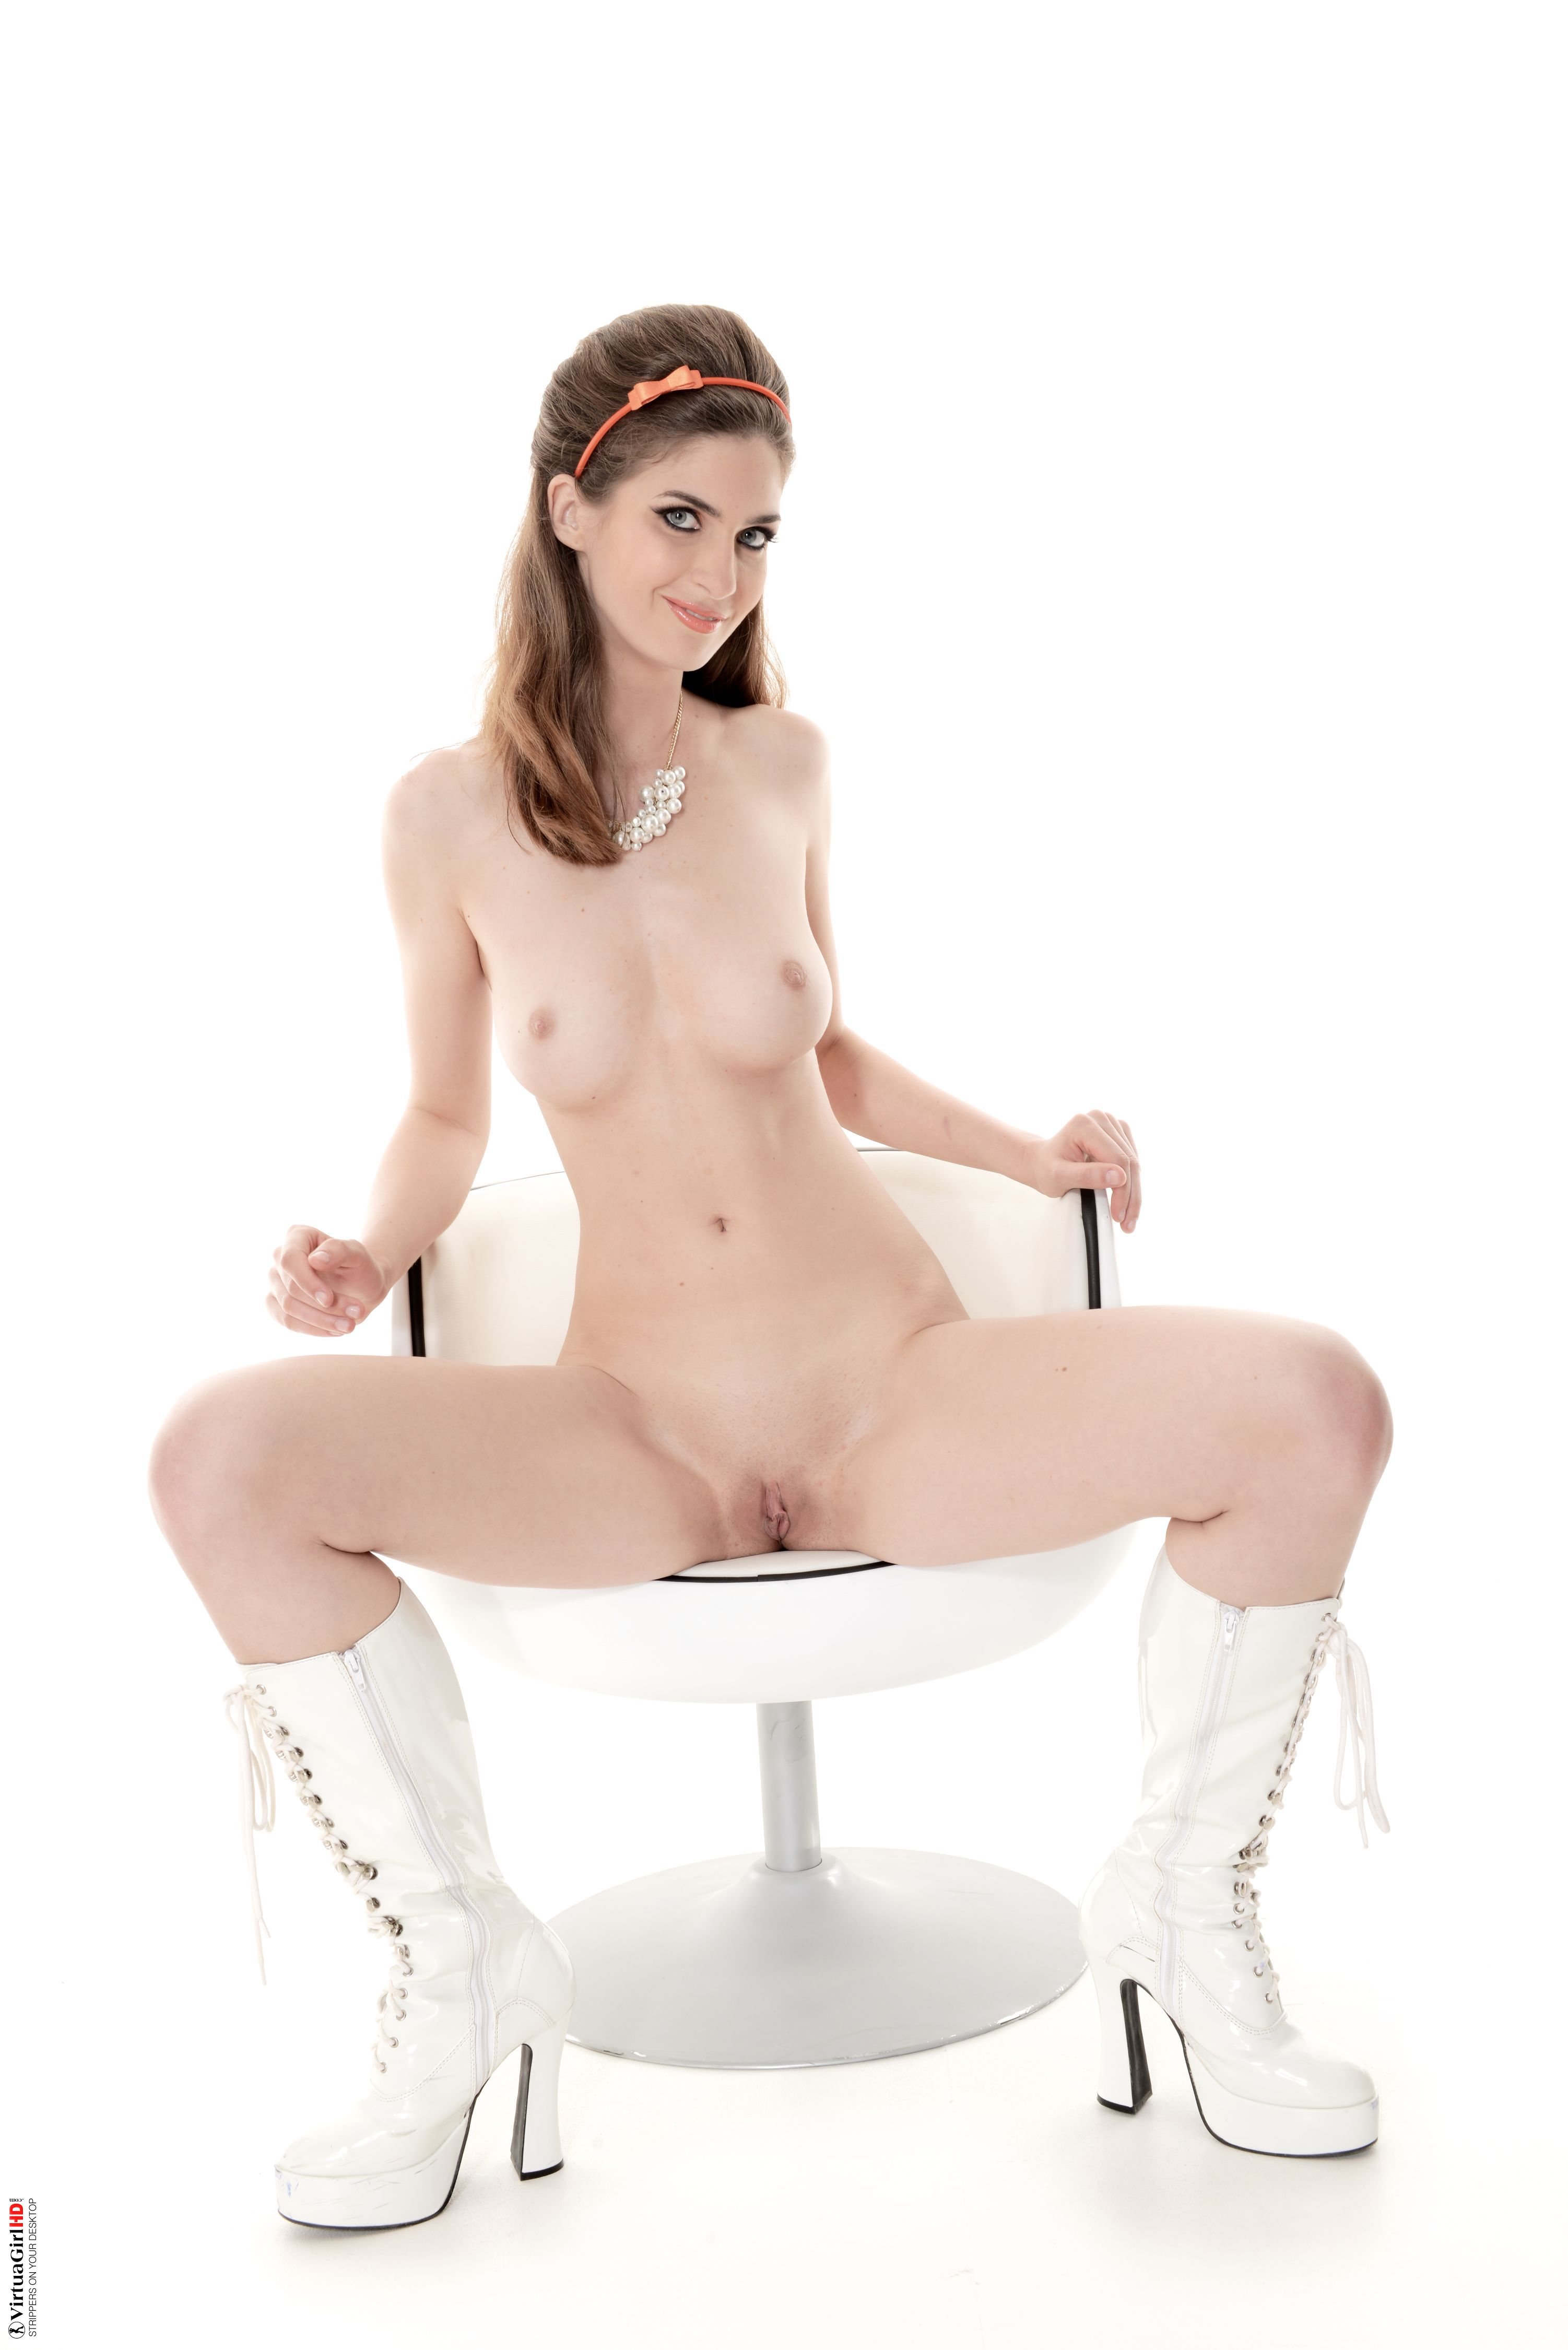 sexy naked girls wallpaper